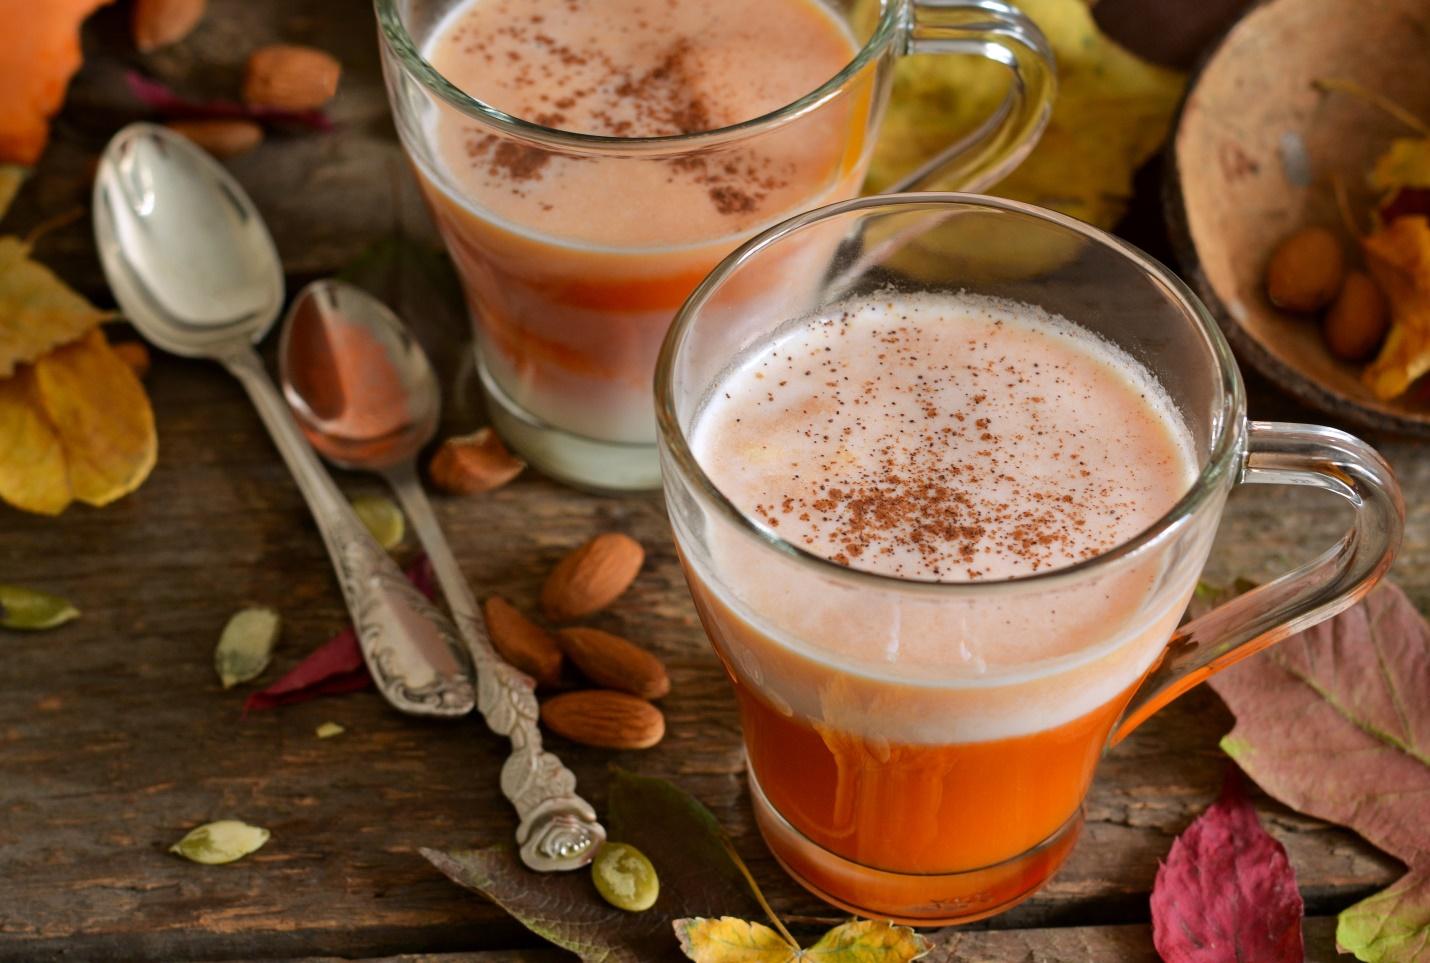 Festive Holiday Coffee Recipes